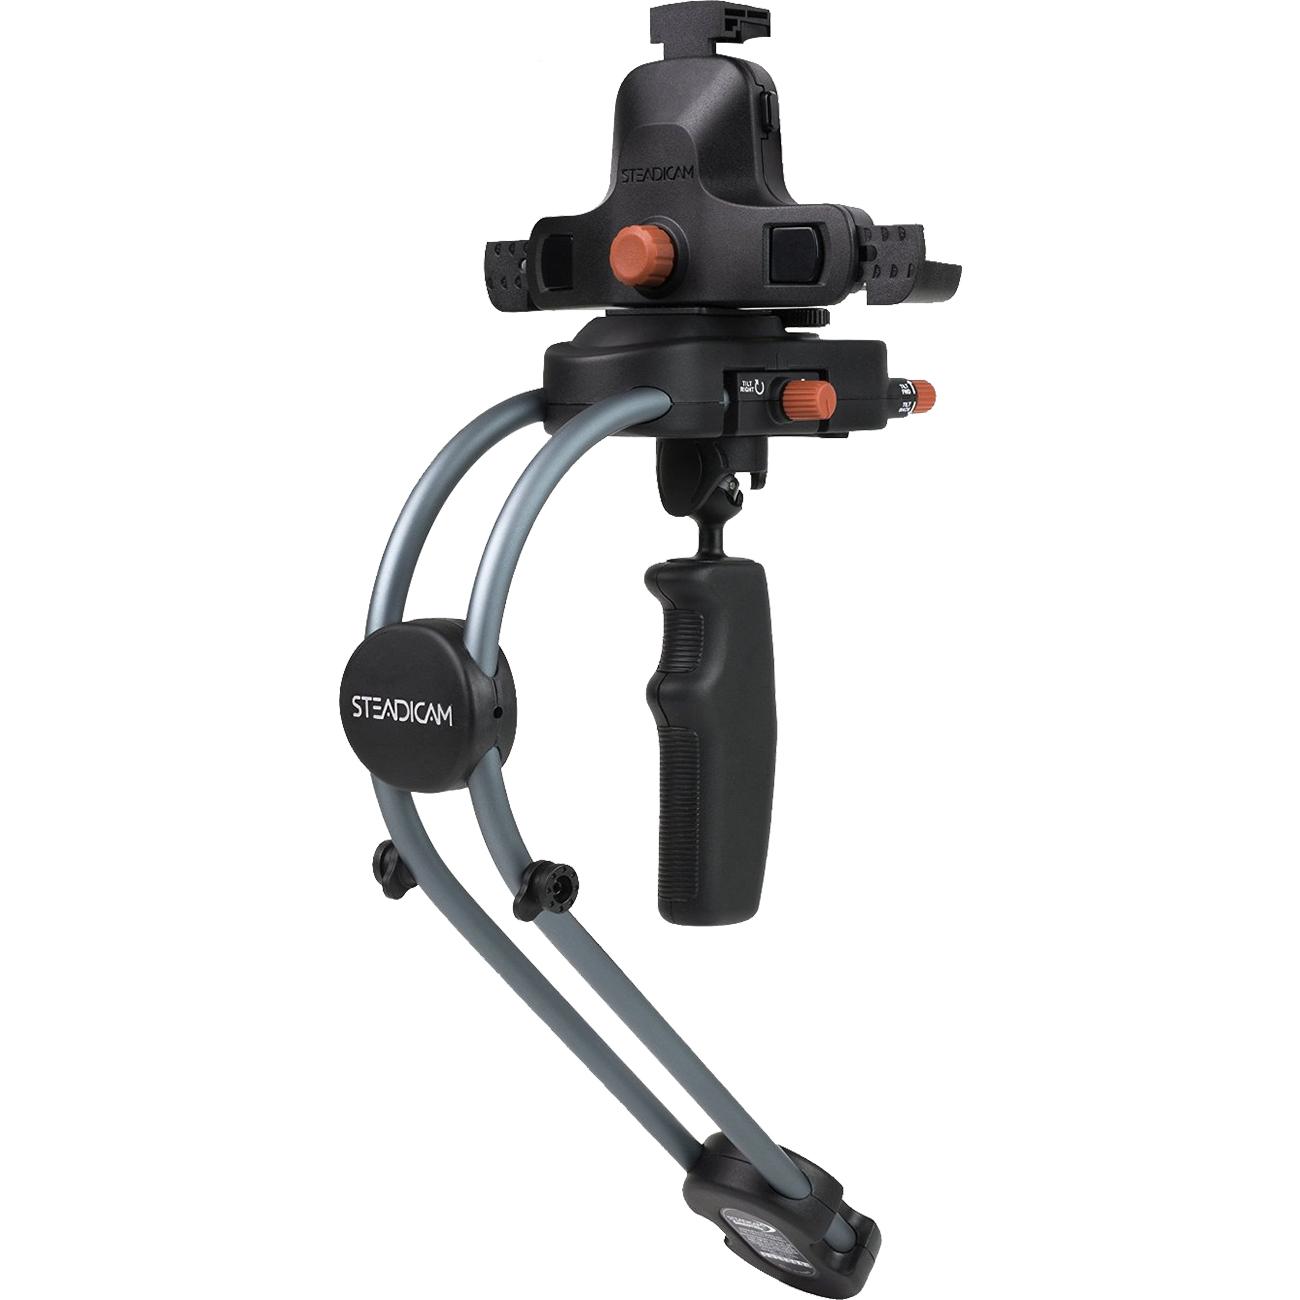 Steadicam Smoothee Video Stabilizer with Universal Smartp...